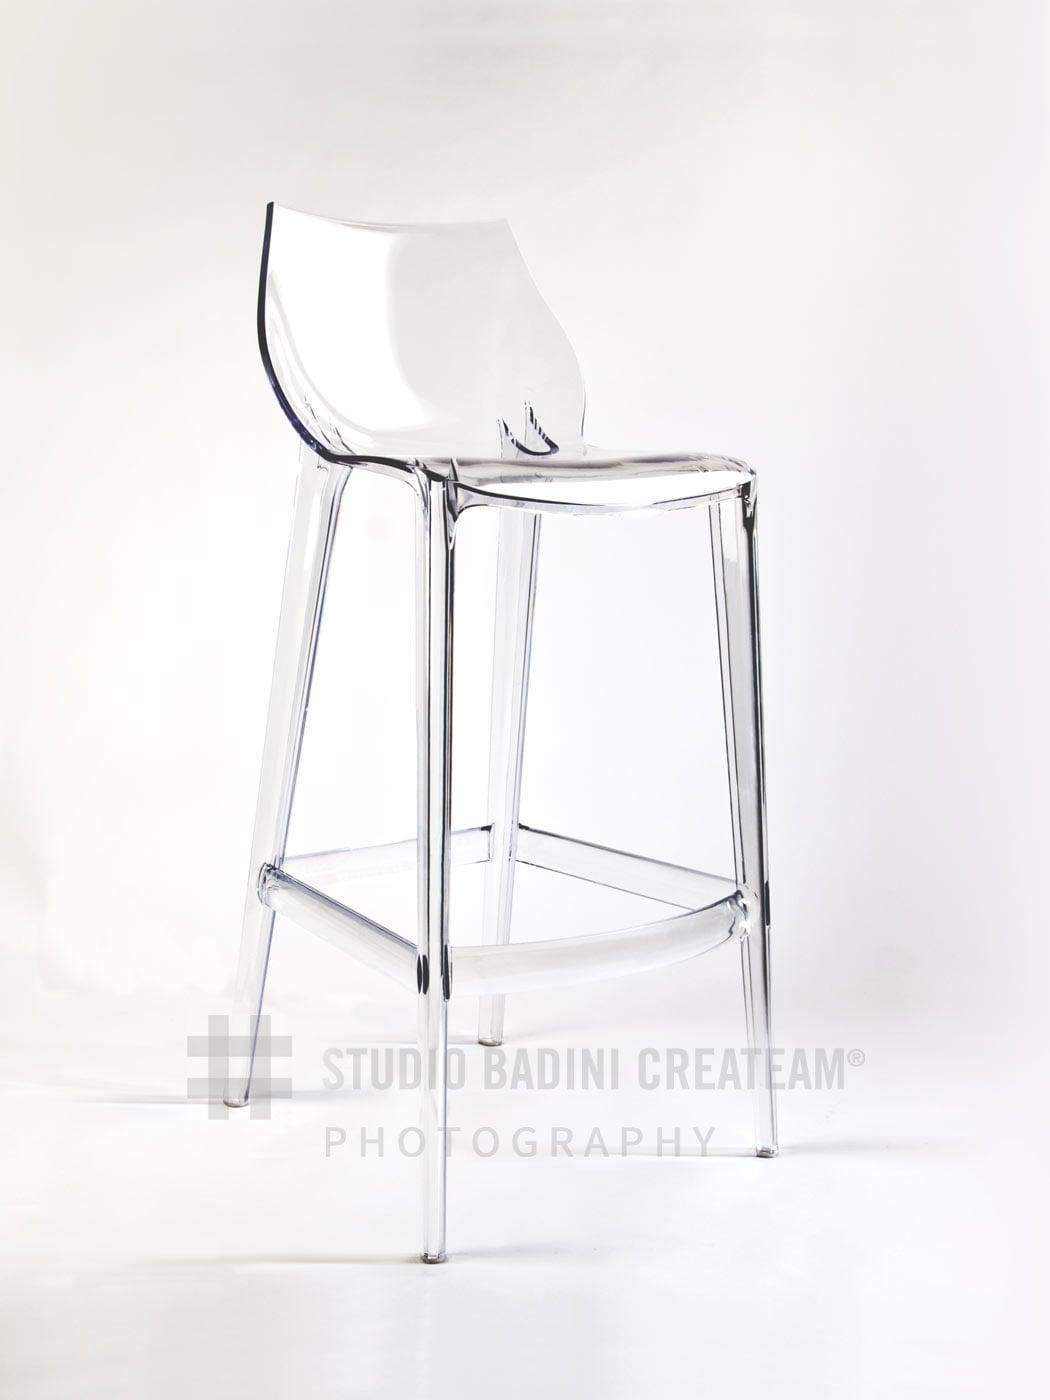 Badini Creative Studio - fotografia - bellelli - sedia